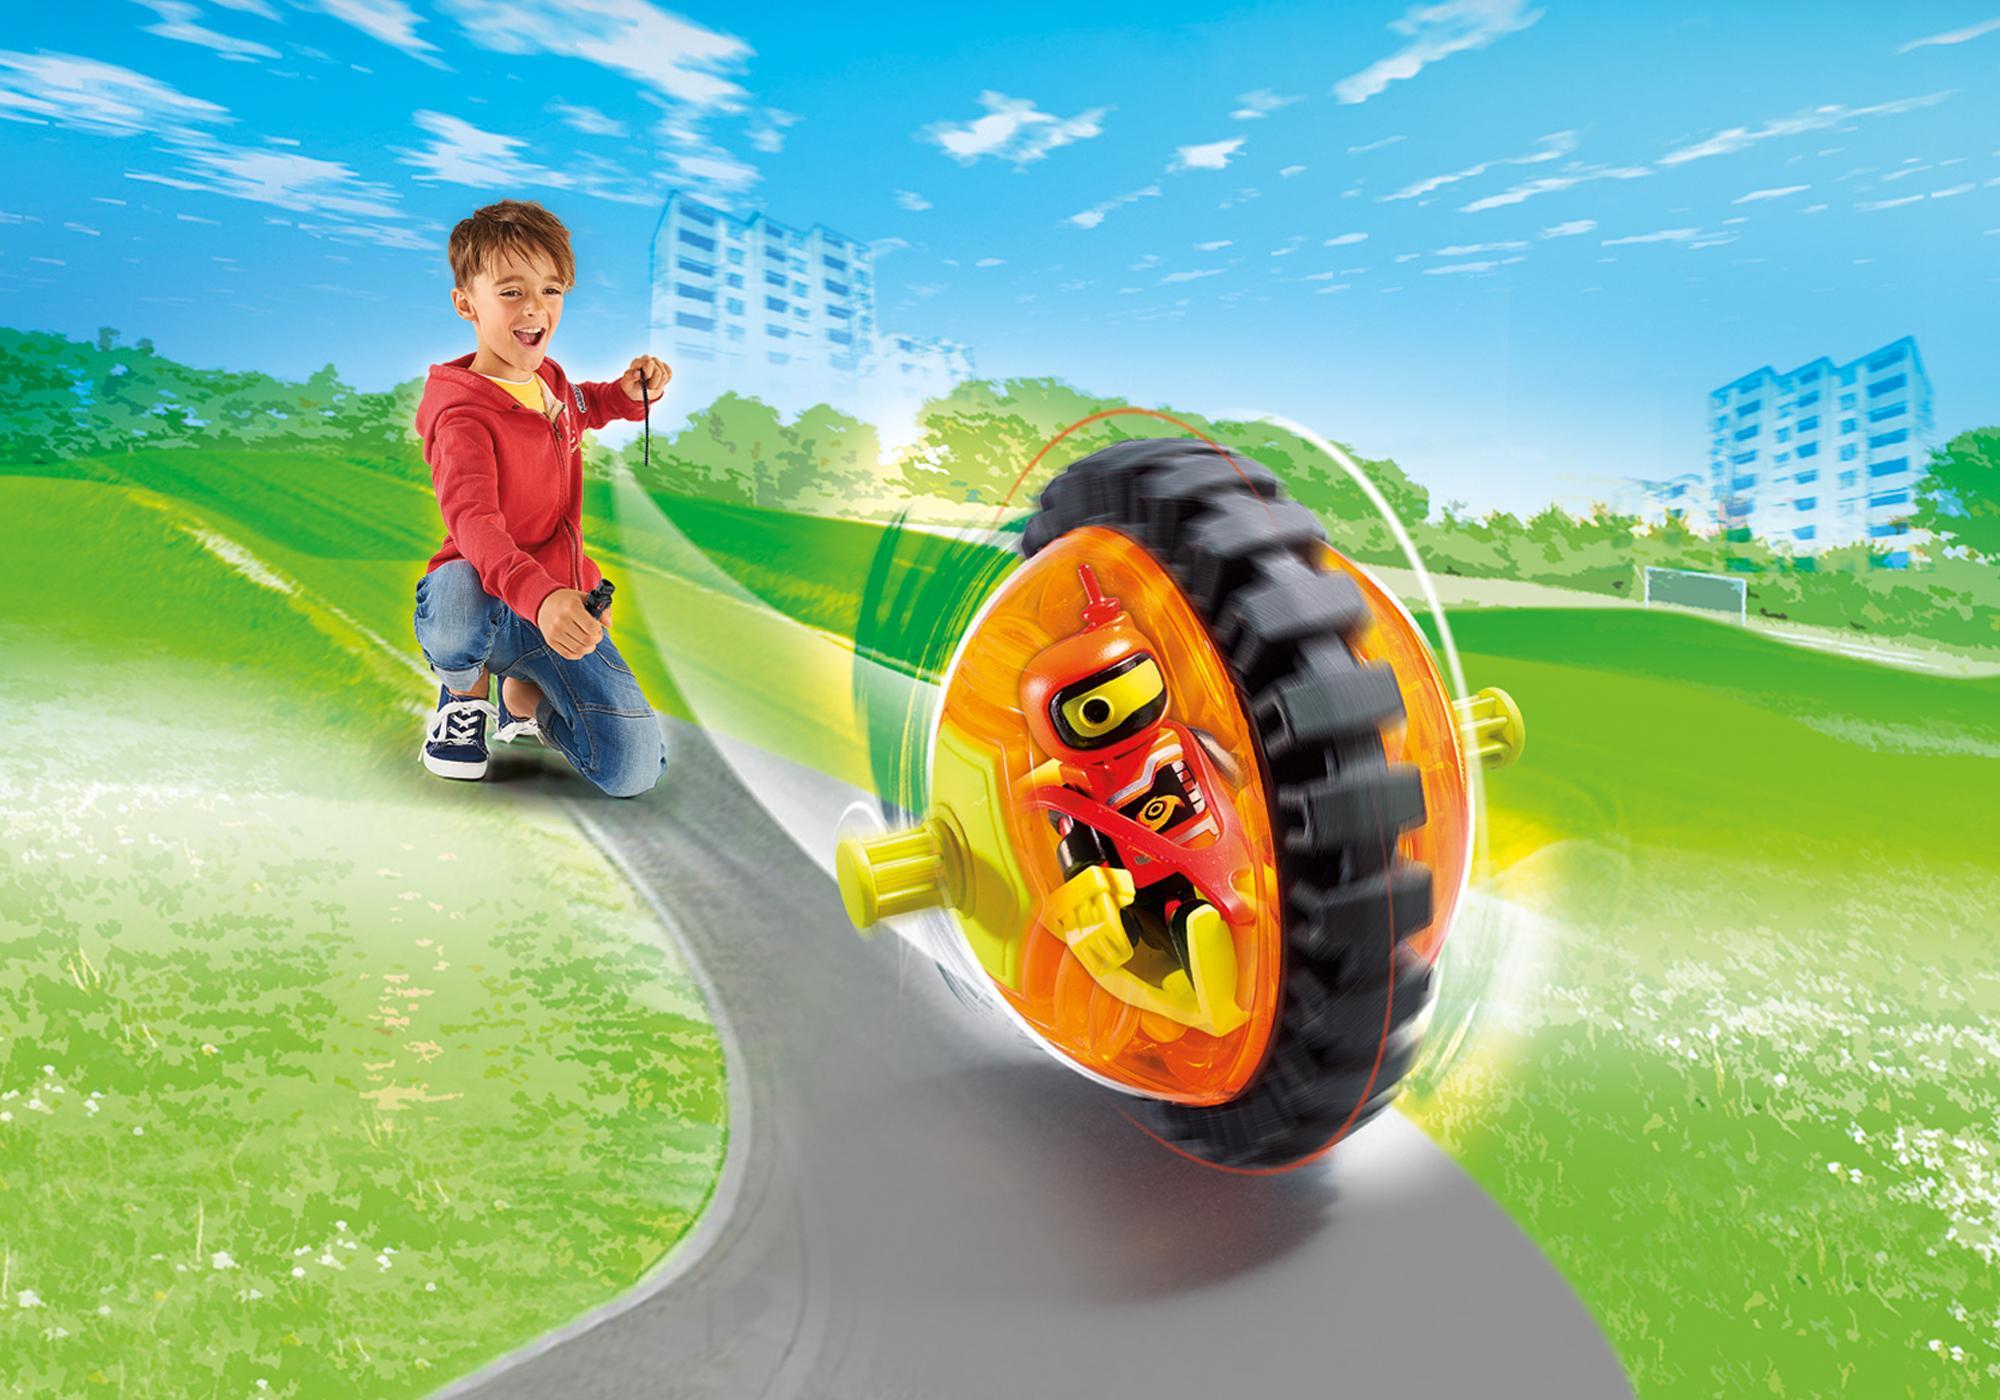 9203_product_detail/Speed Roller arancio con robot